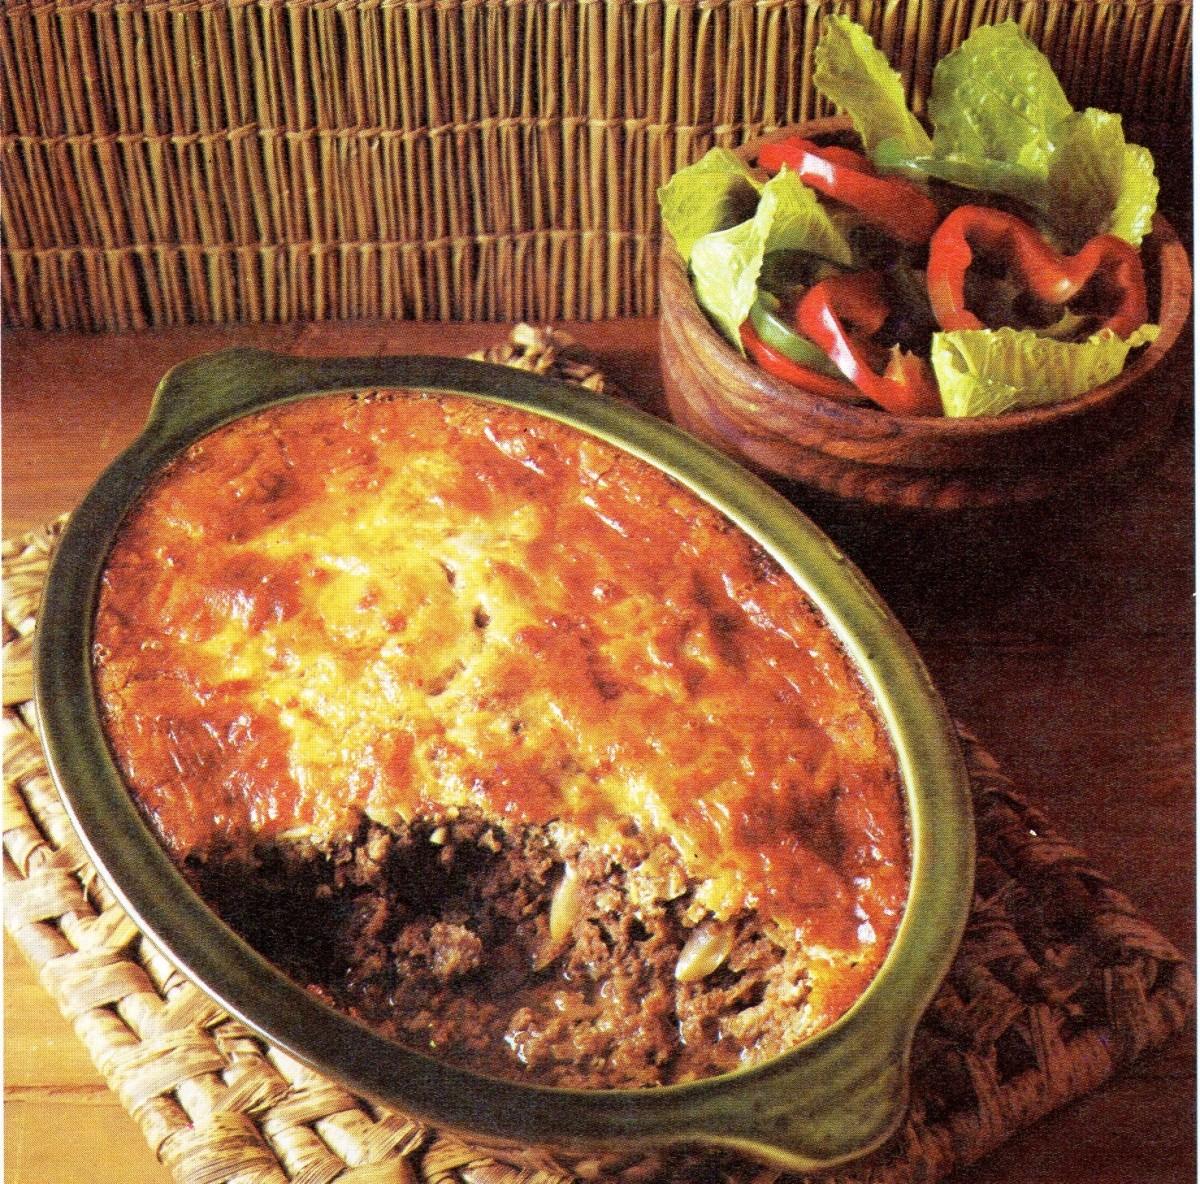 Gourmet Recipe: South African Bobotie